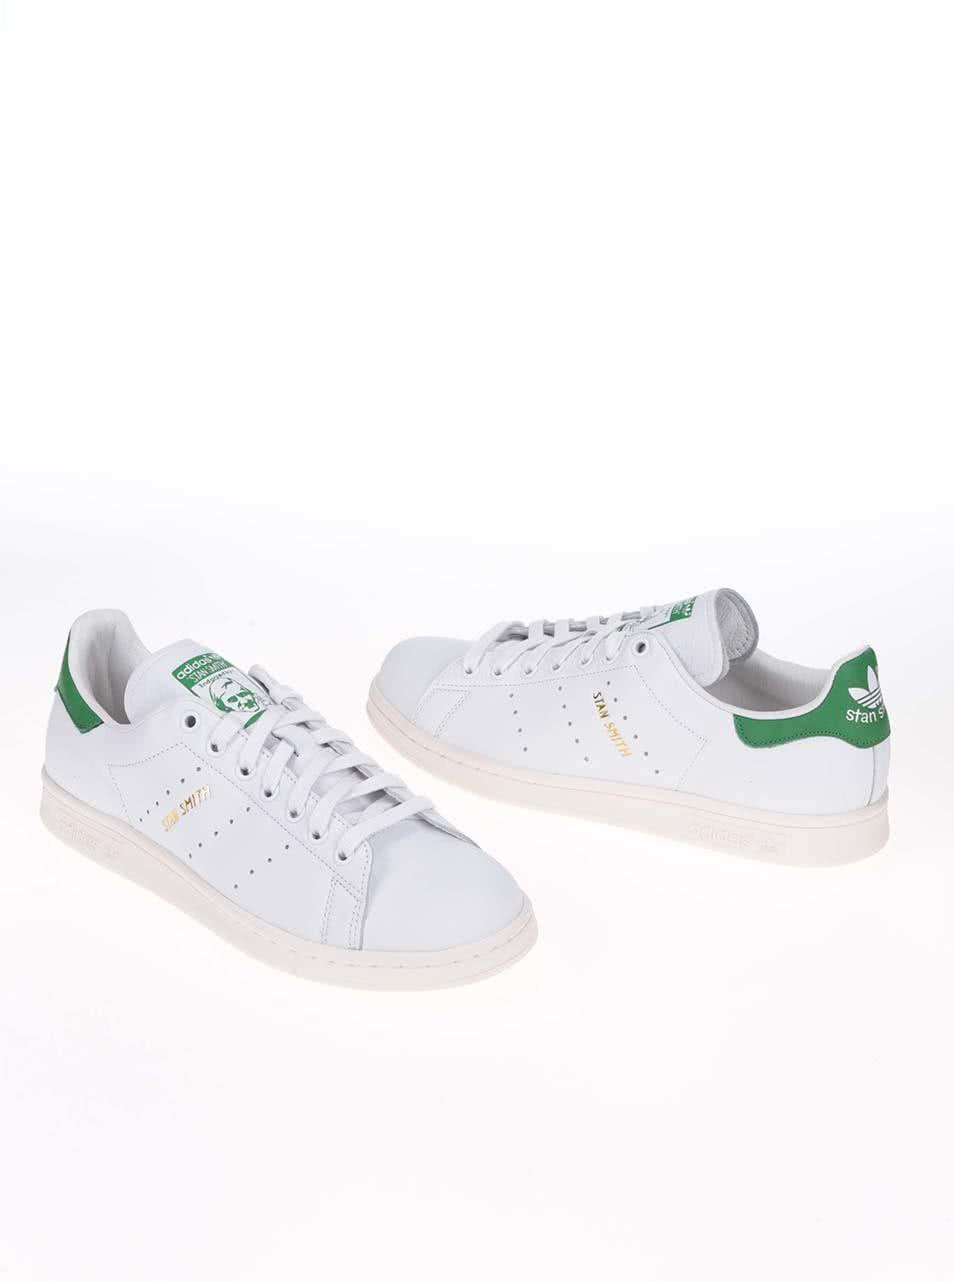 Zeleno-biele pánske kožené tenisky adidas Originals Stan Smith ... ff1a596ec7